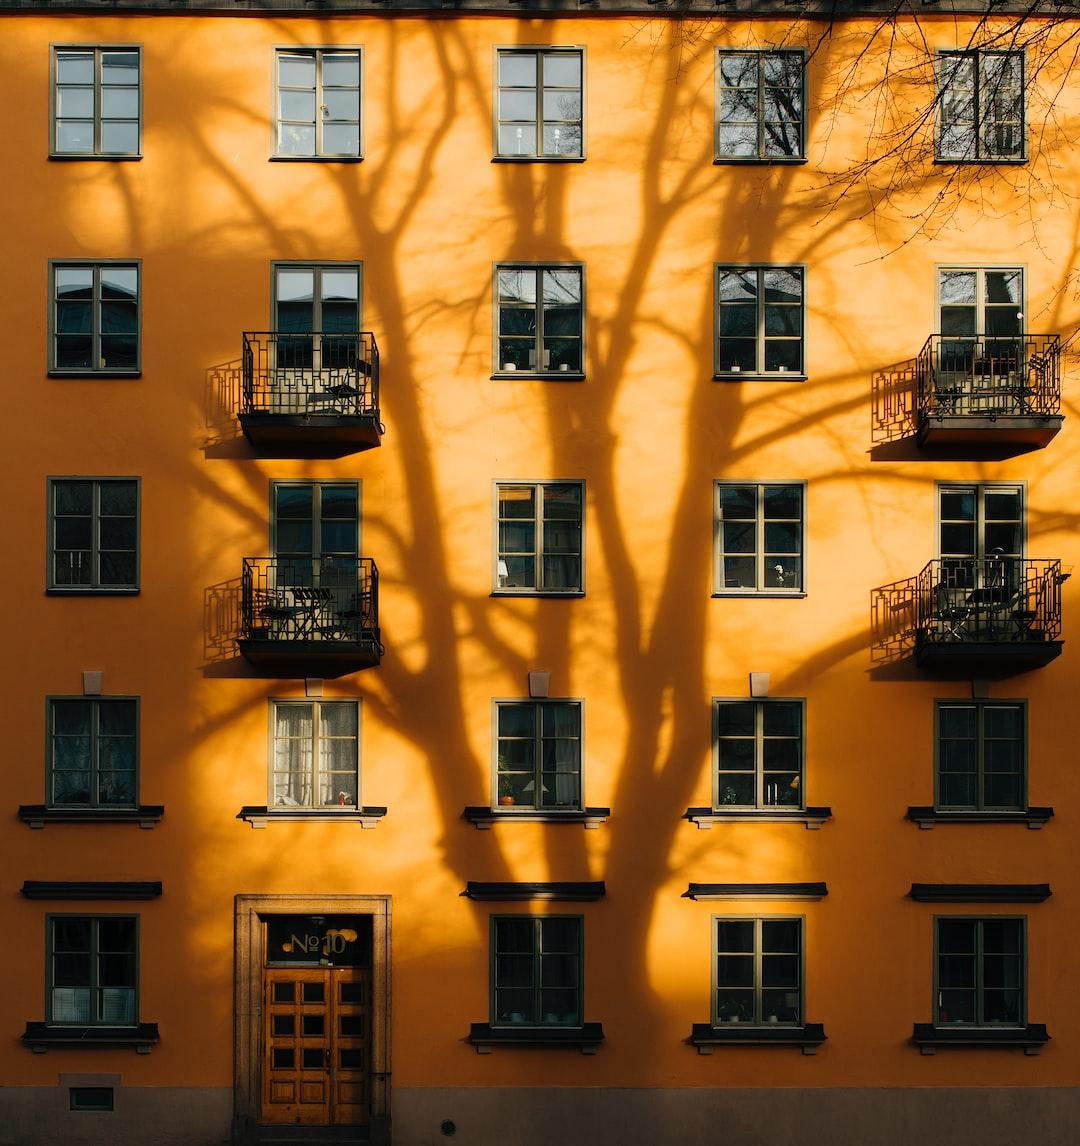 Building Orange Sweden And Stockholm Hd Photo By Jon